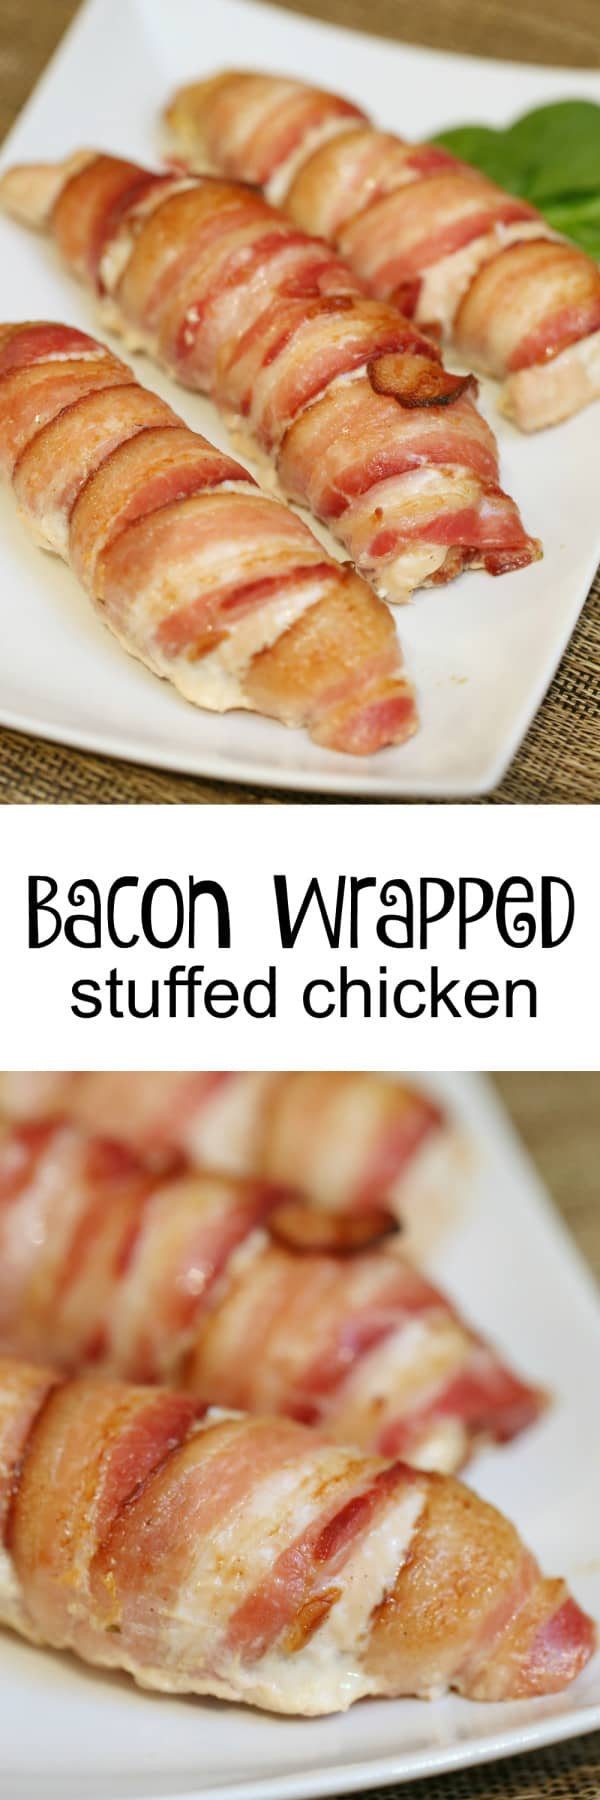 bacon wrapped stuffed chicken recipe